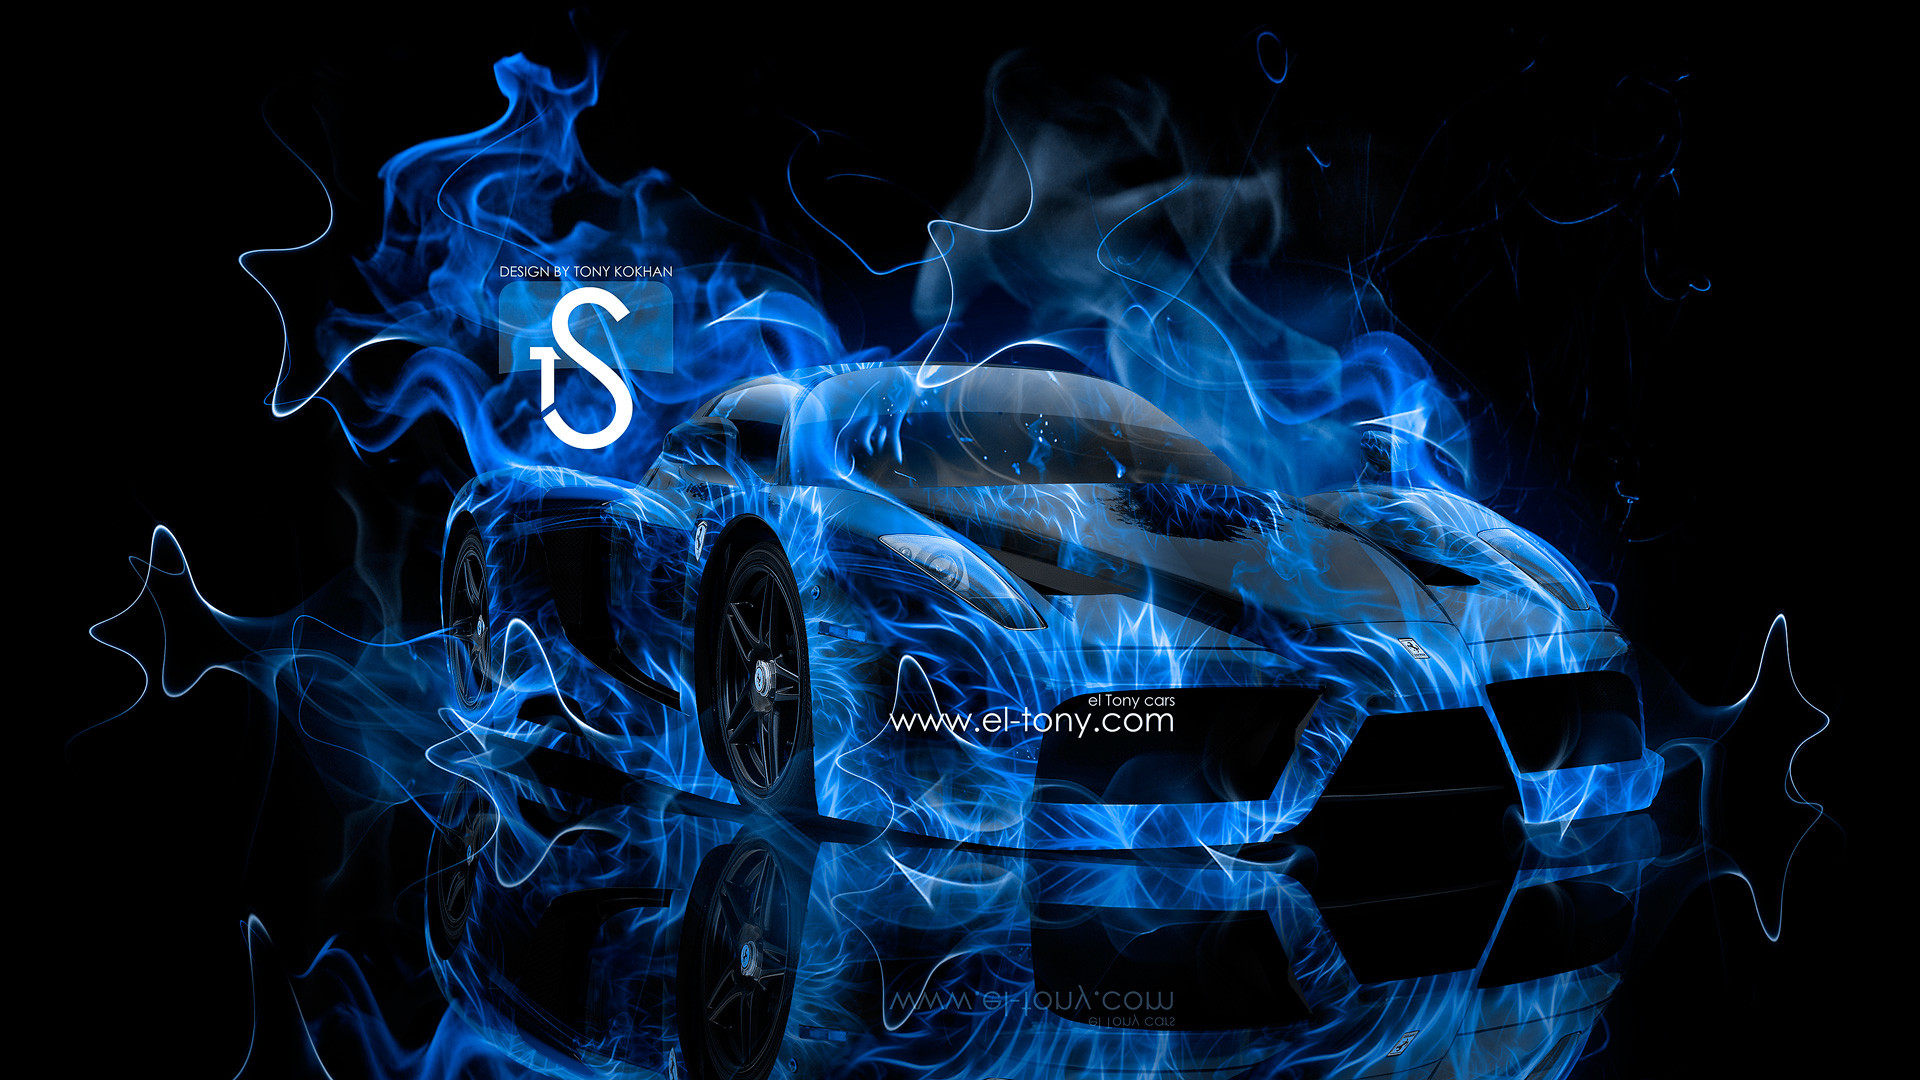 Res: 1920x1080, Ferrari-Enzo-Blue-Fire-Car-2013-Abstract-Smoke-